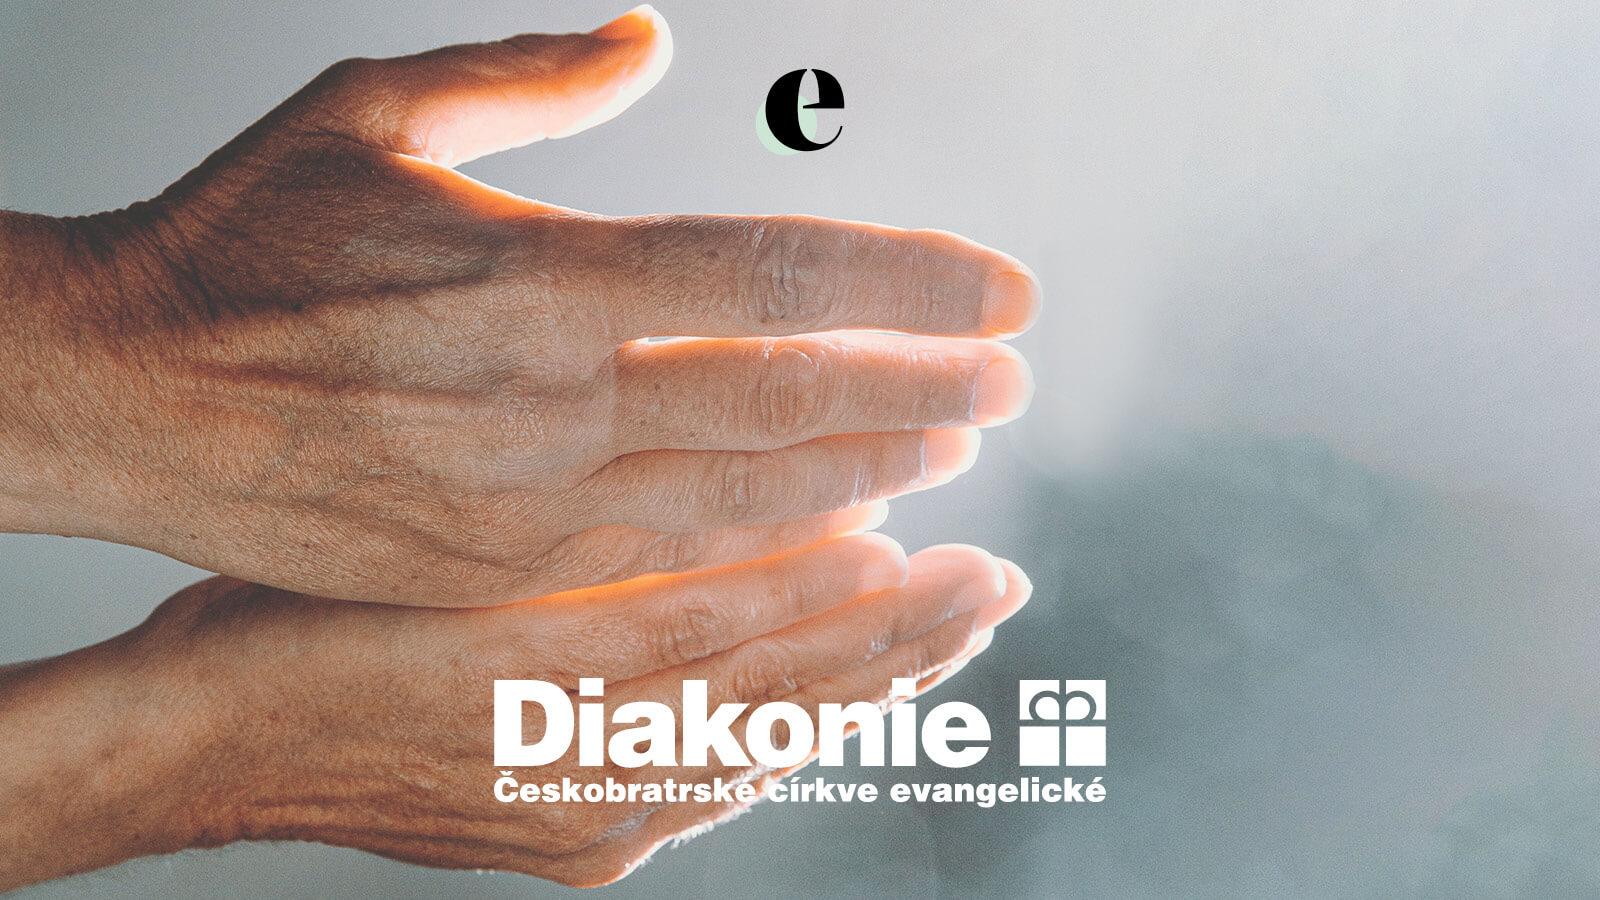 Diaconia Chooses Ewing